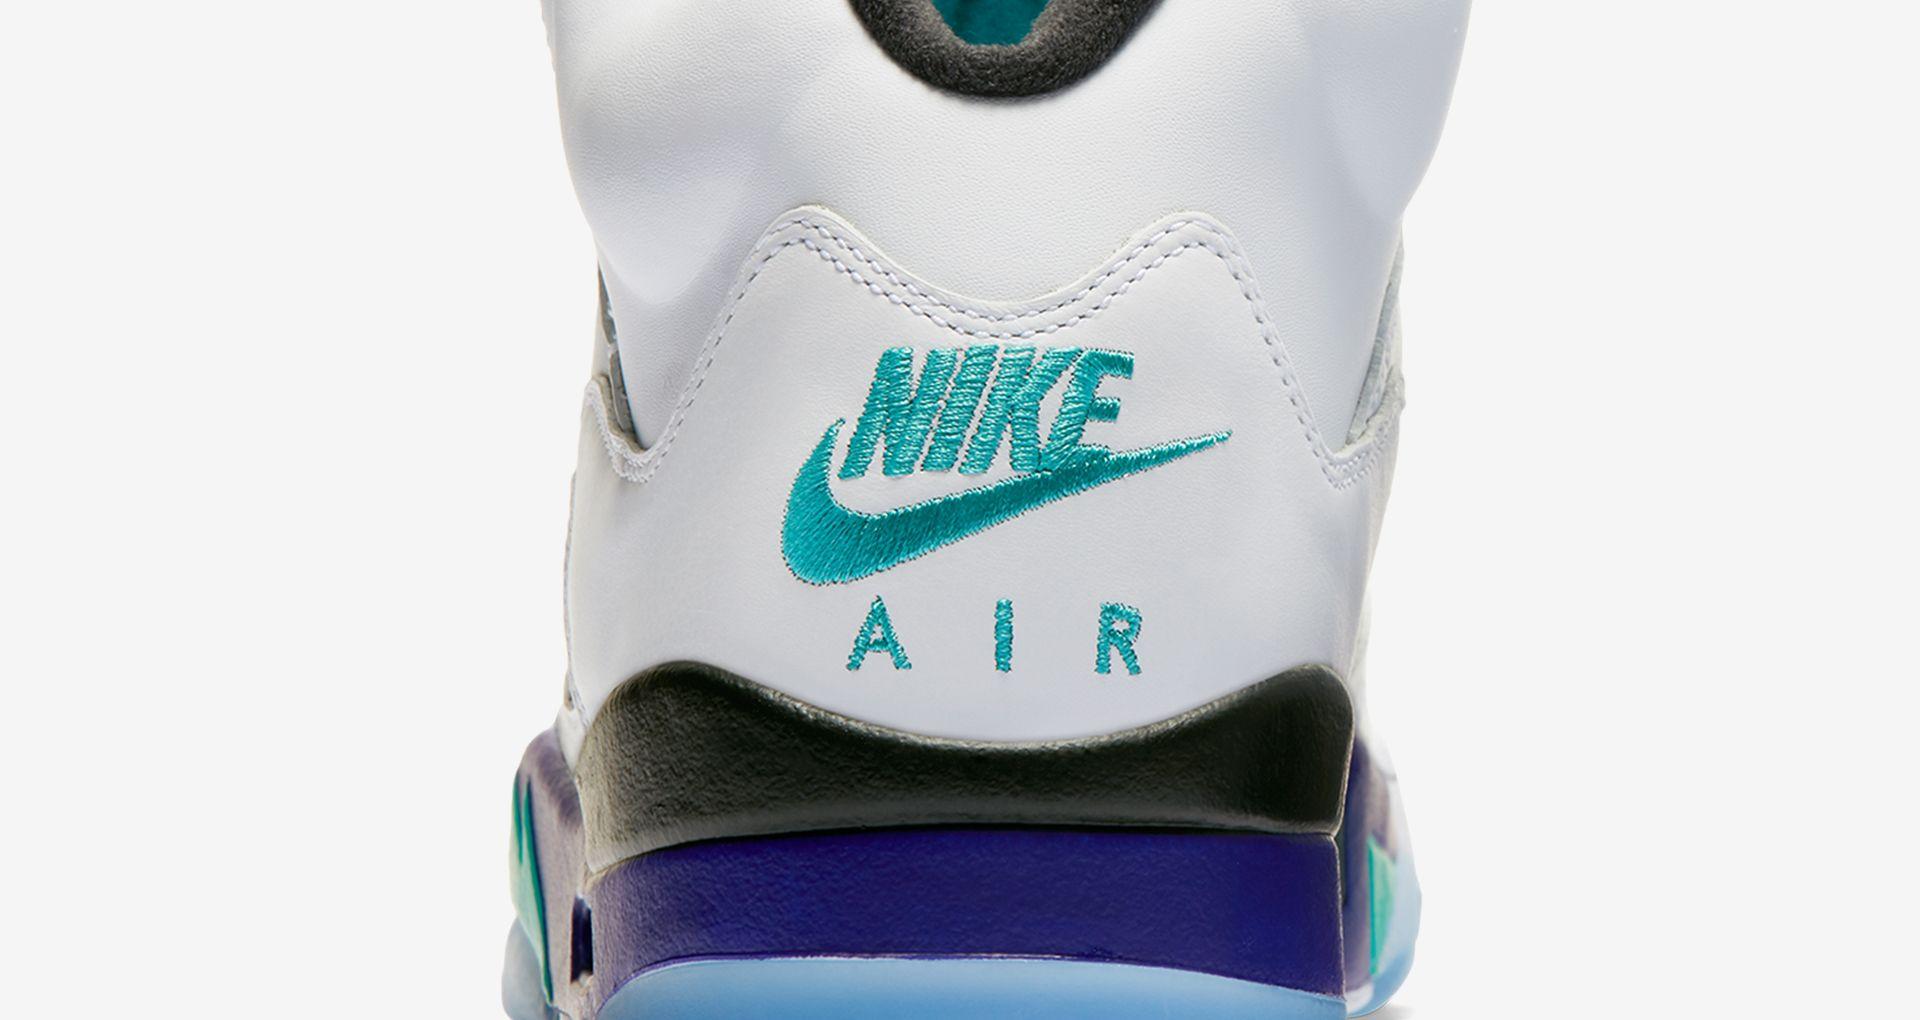 715b076c9fc Air Jordan 5 Retro Grape NRG - Fresh Prince | Page 29 | NikeTalk